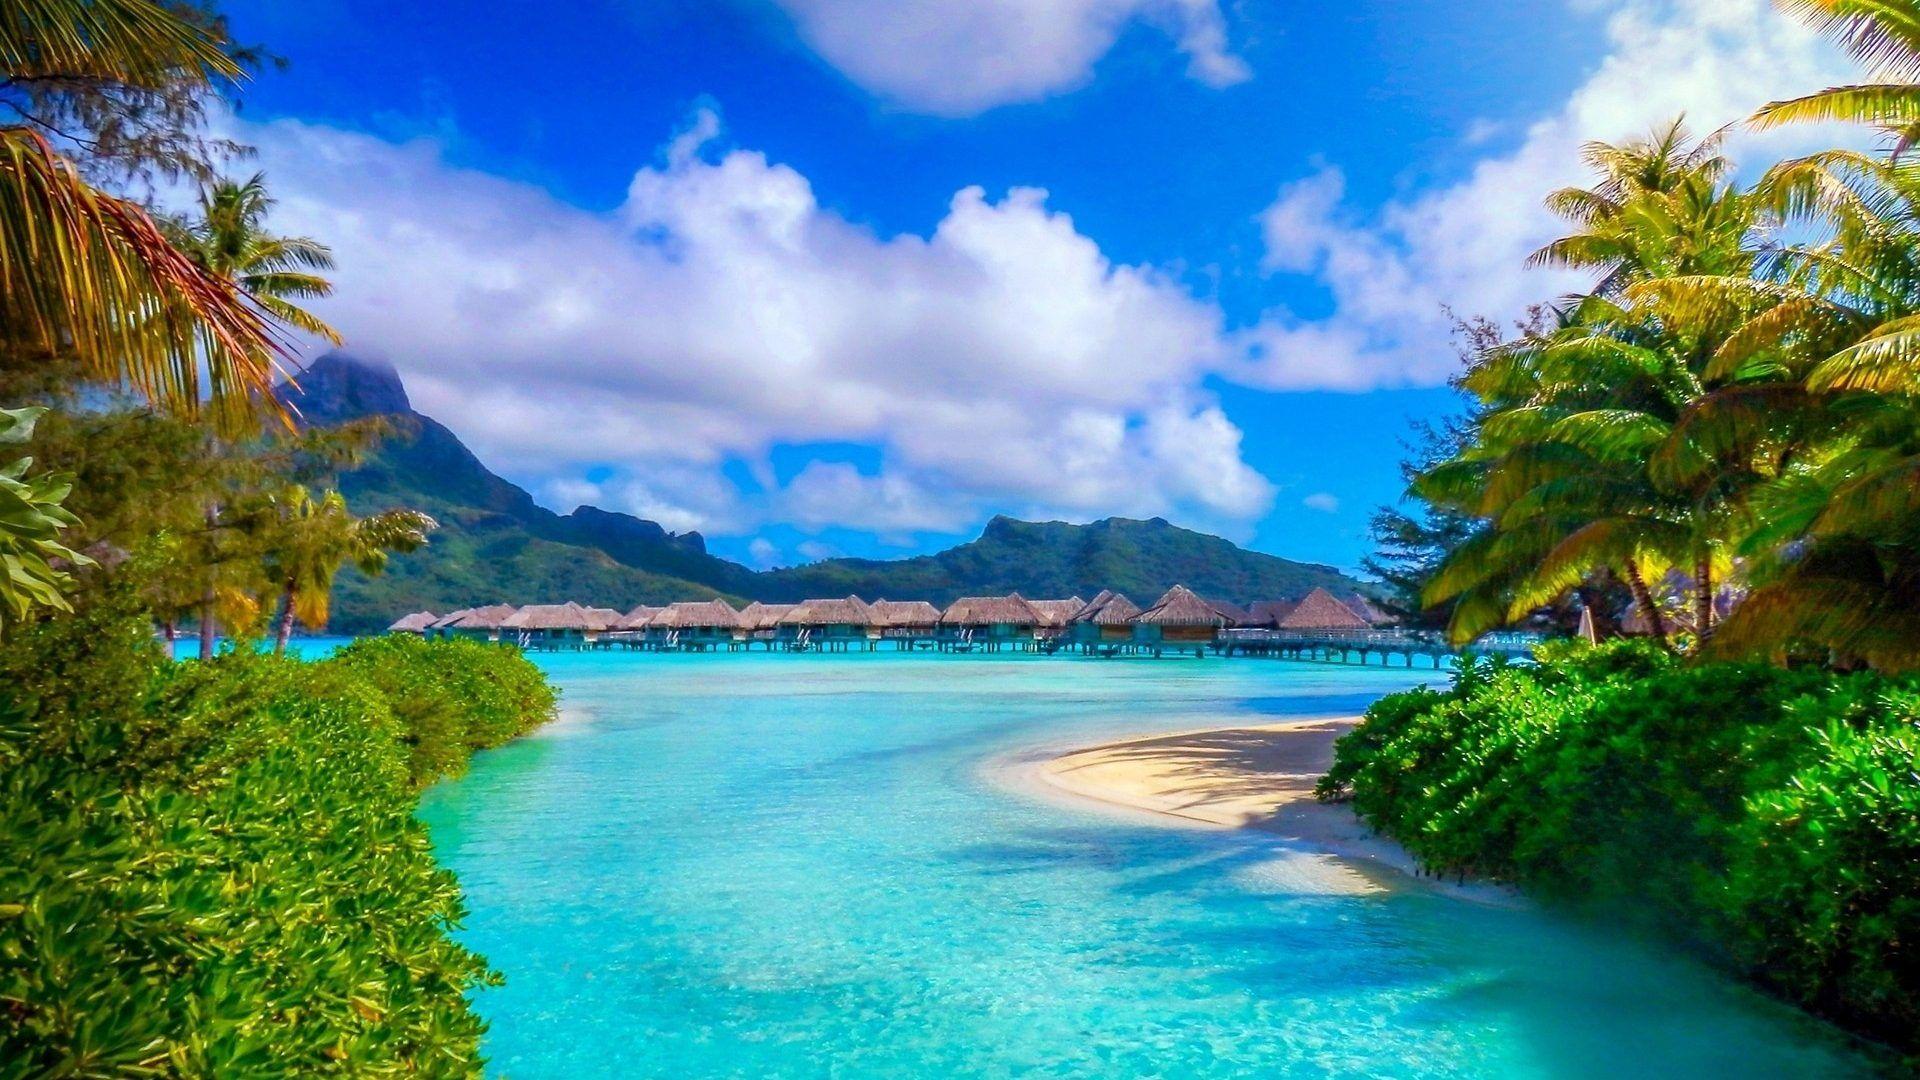 Bora Bora desktop background free